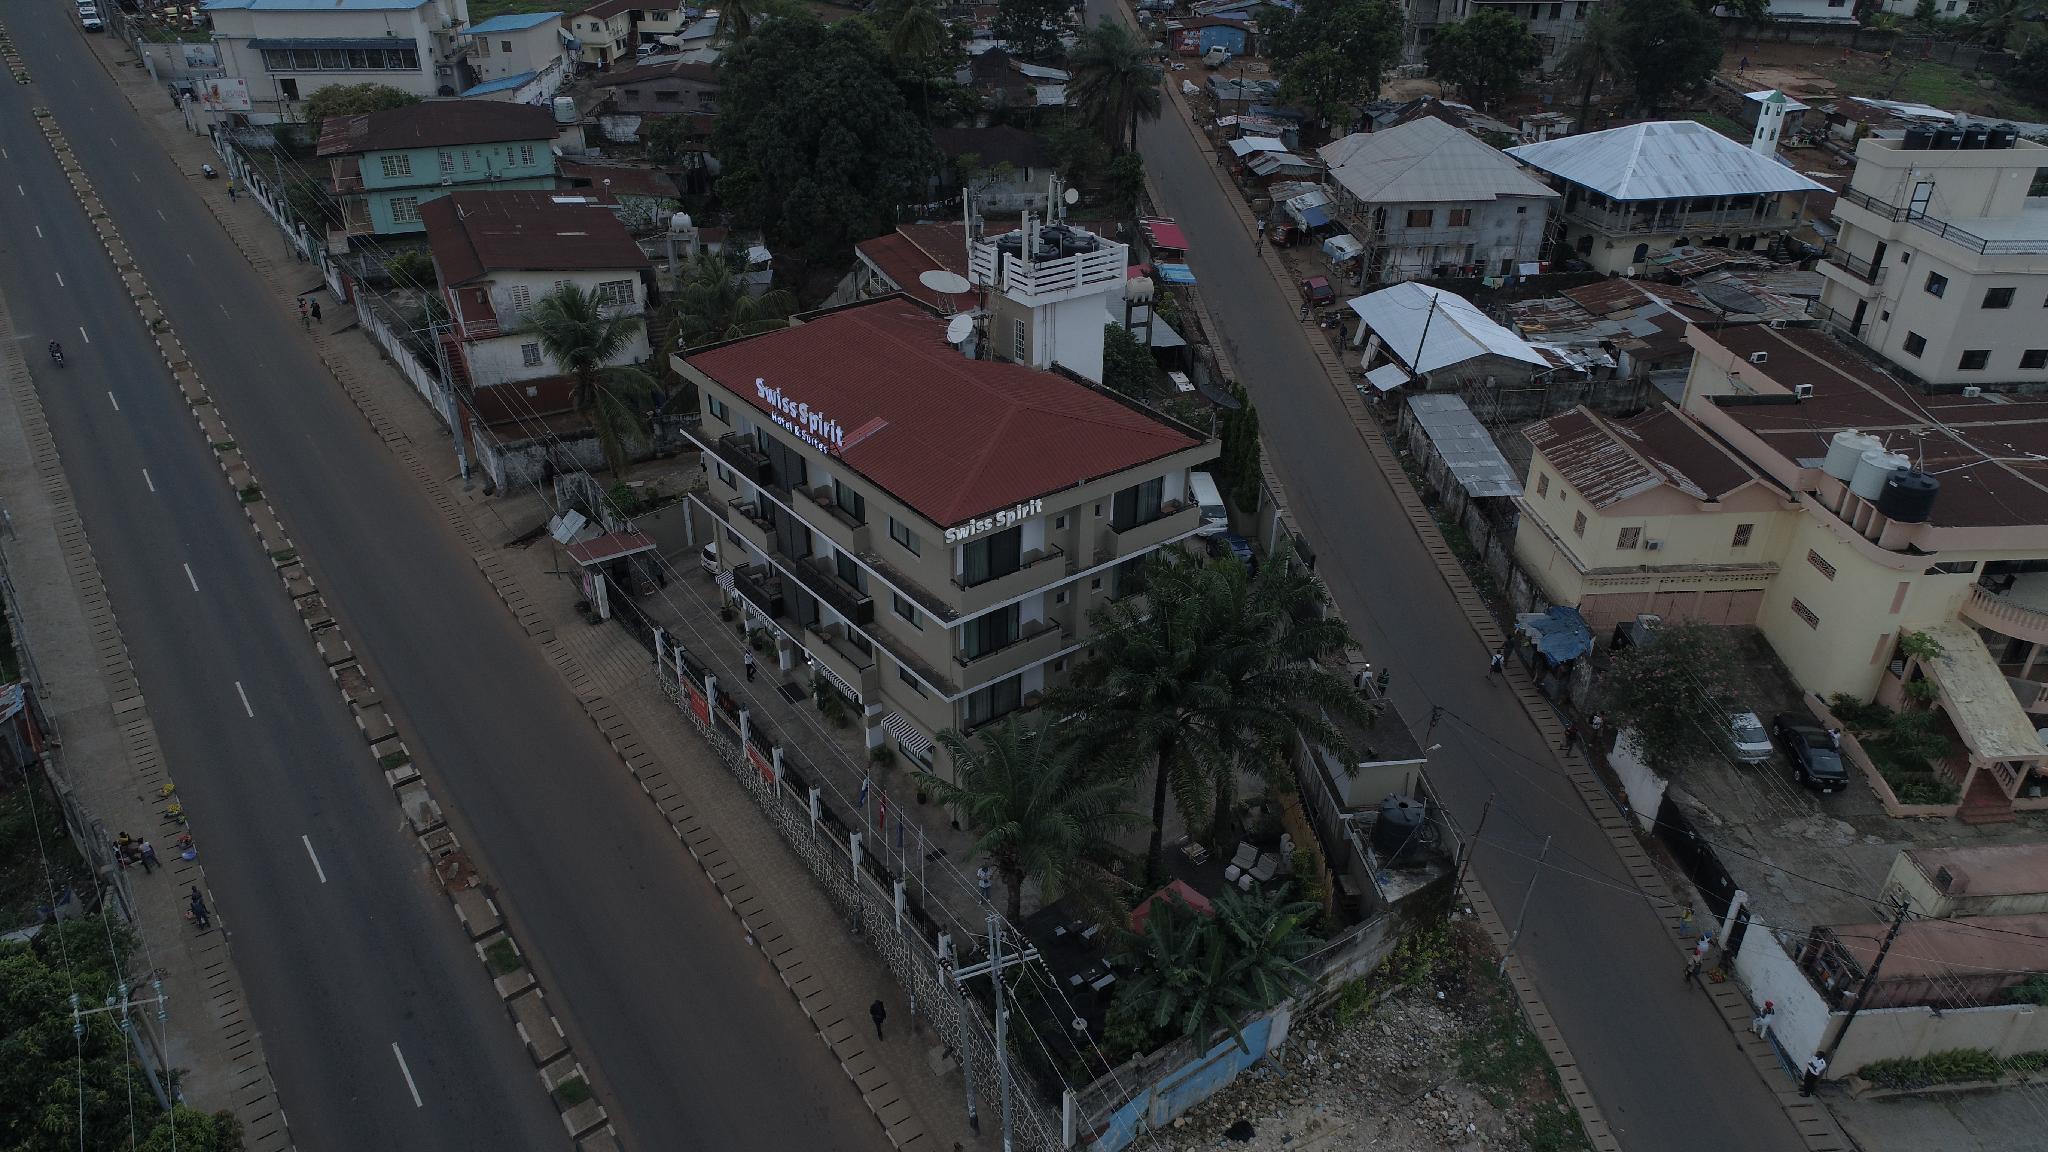 The Swiss Hotel Freetown